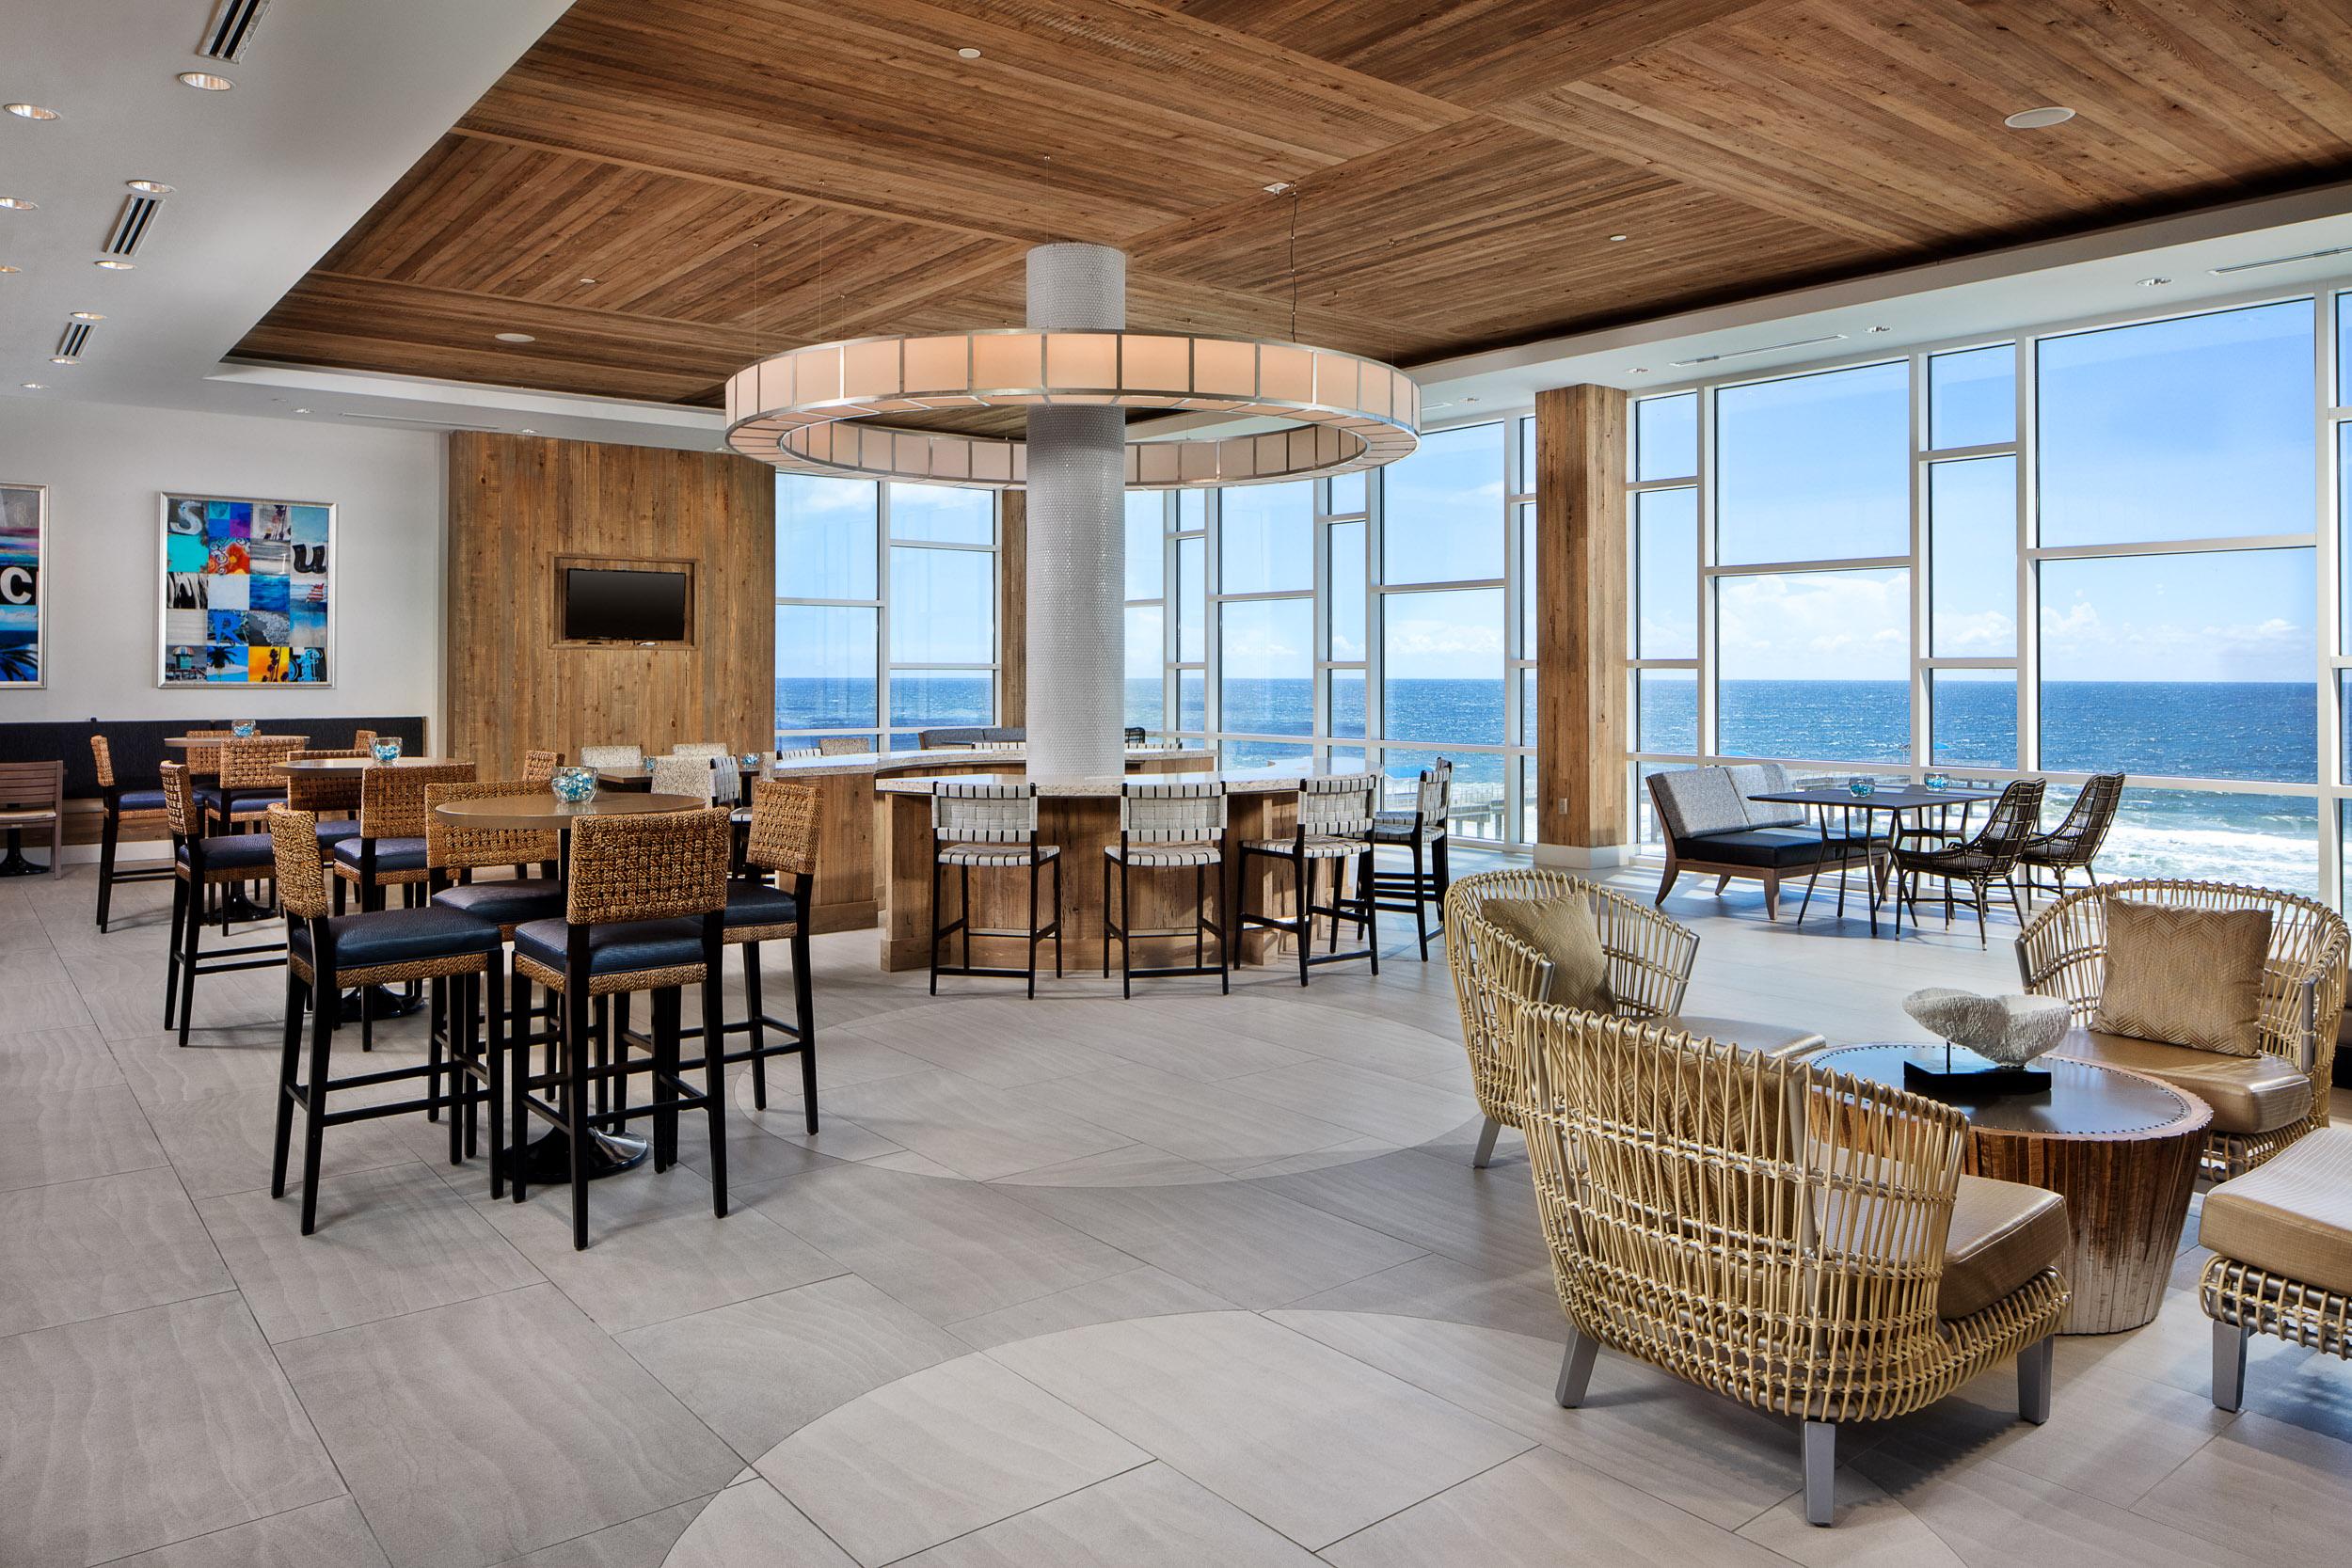 bestwestern_hotel_beachfront_tides-1.jpg